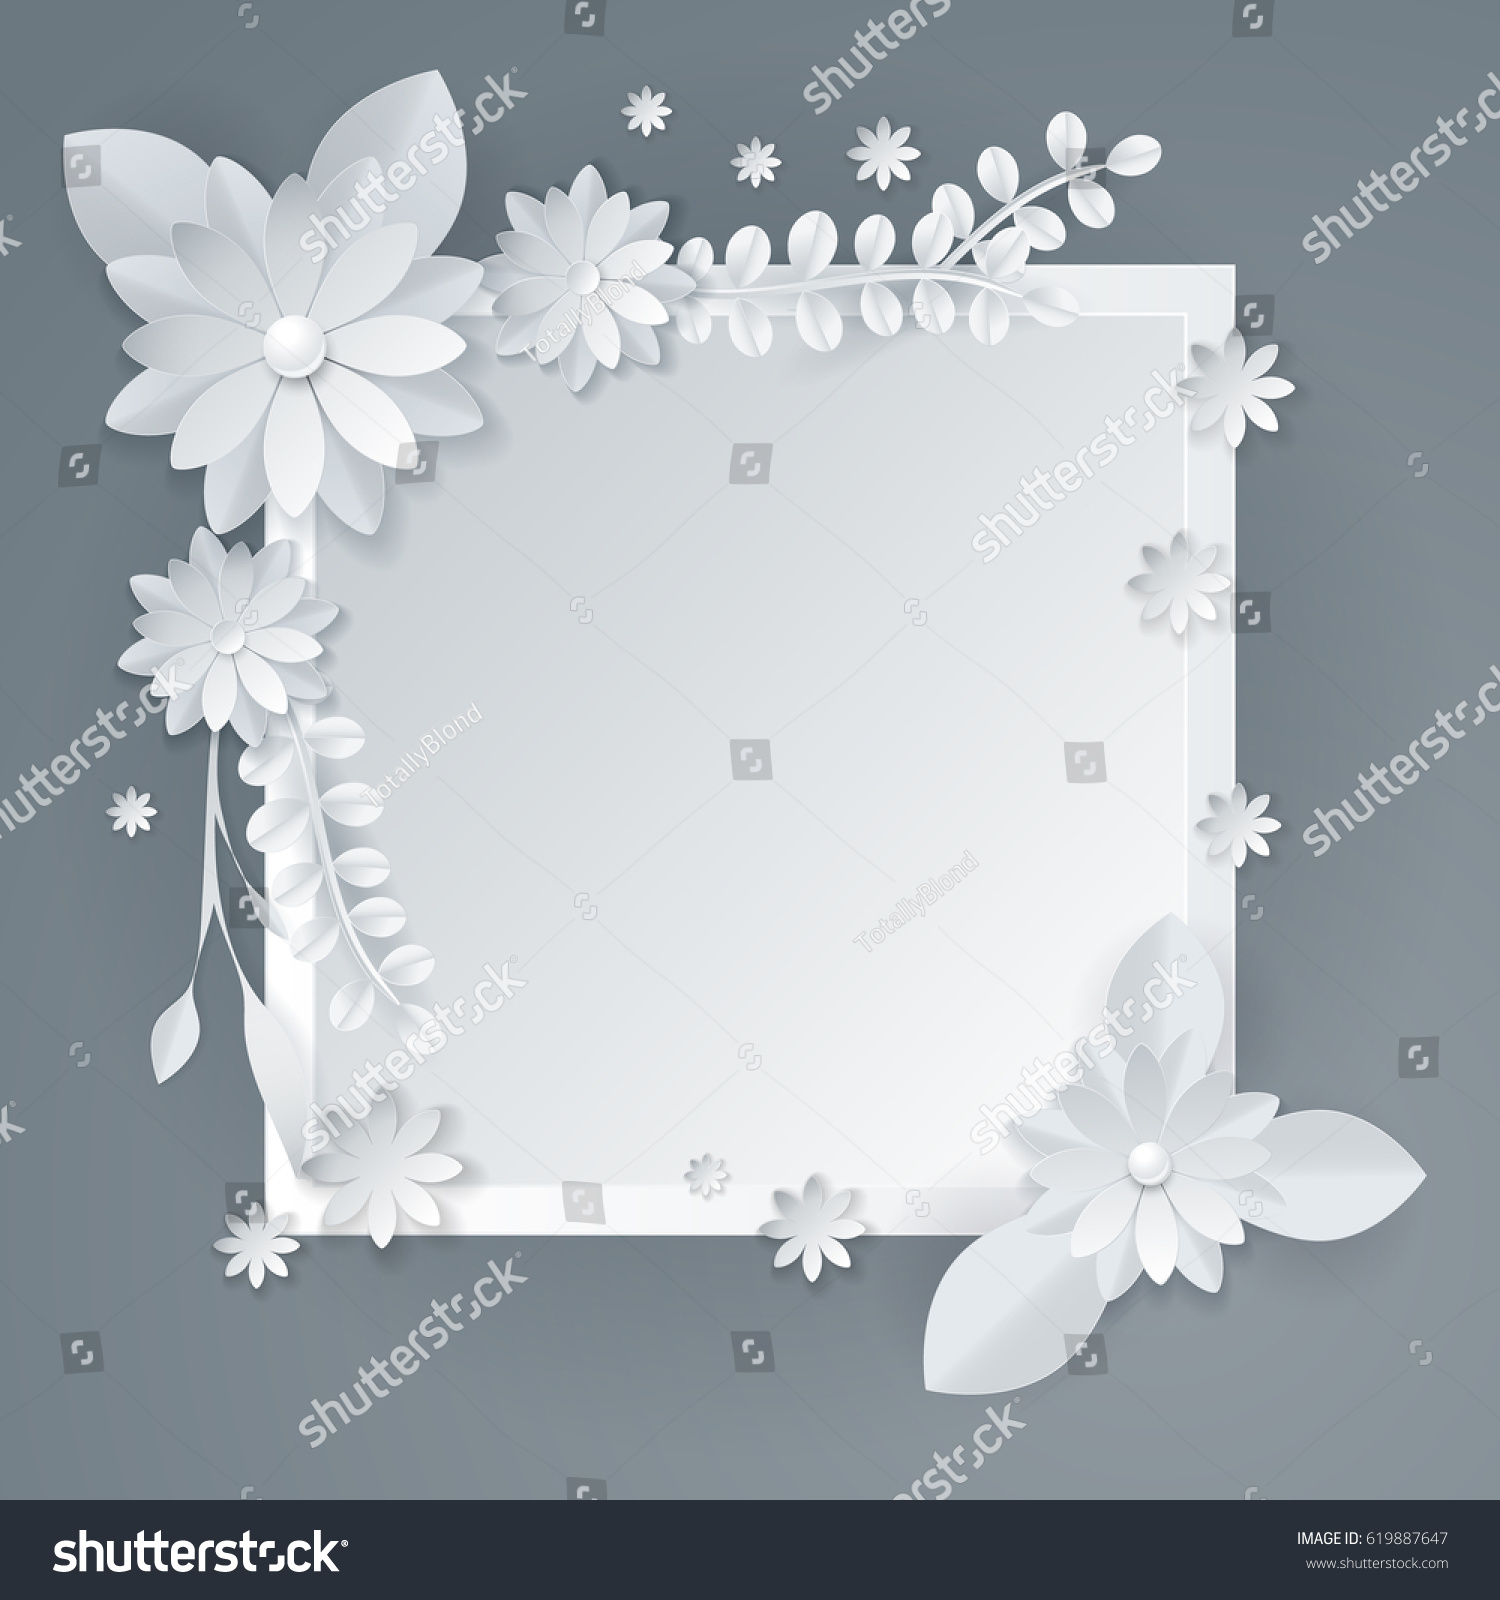 3d white paper craft flowers background stock vector 619887647 3d white paper craft flowers background spring wedding decoration summer bridal bouquet greeting jeuxipadfo Choice Image